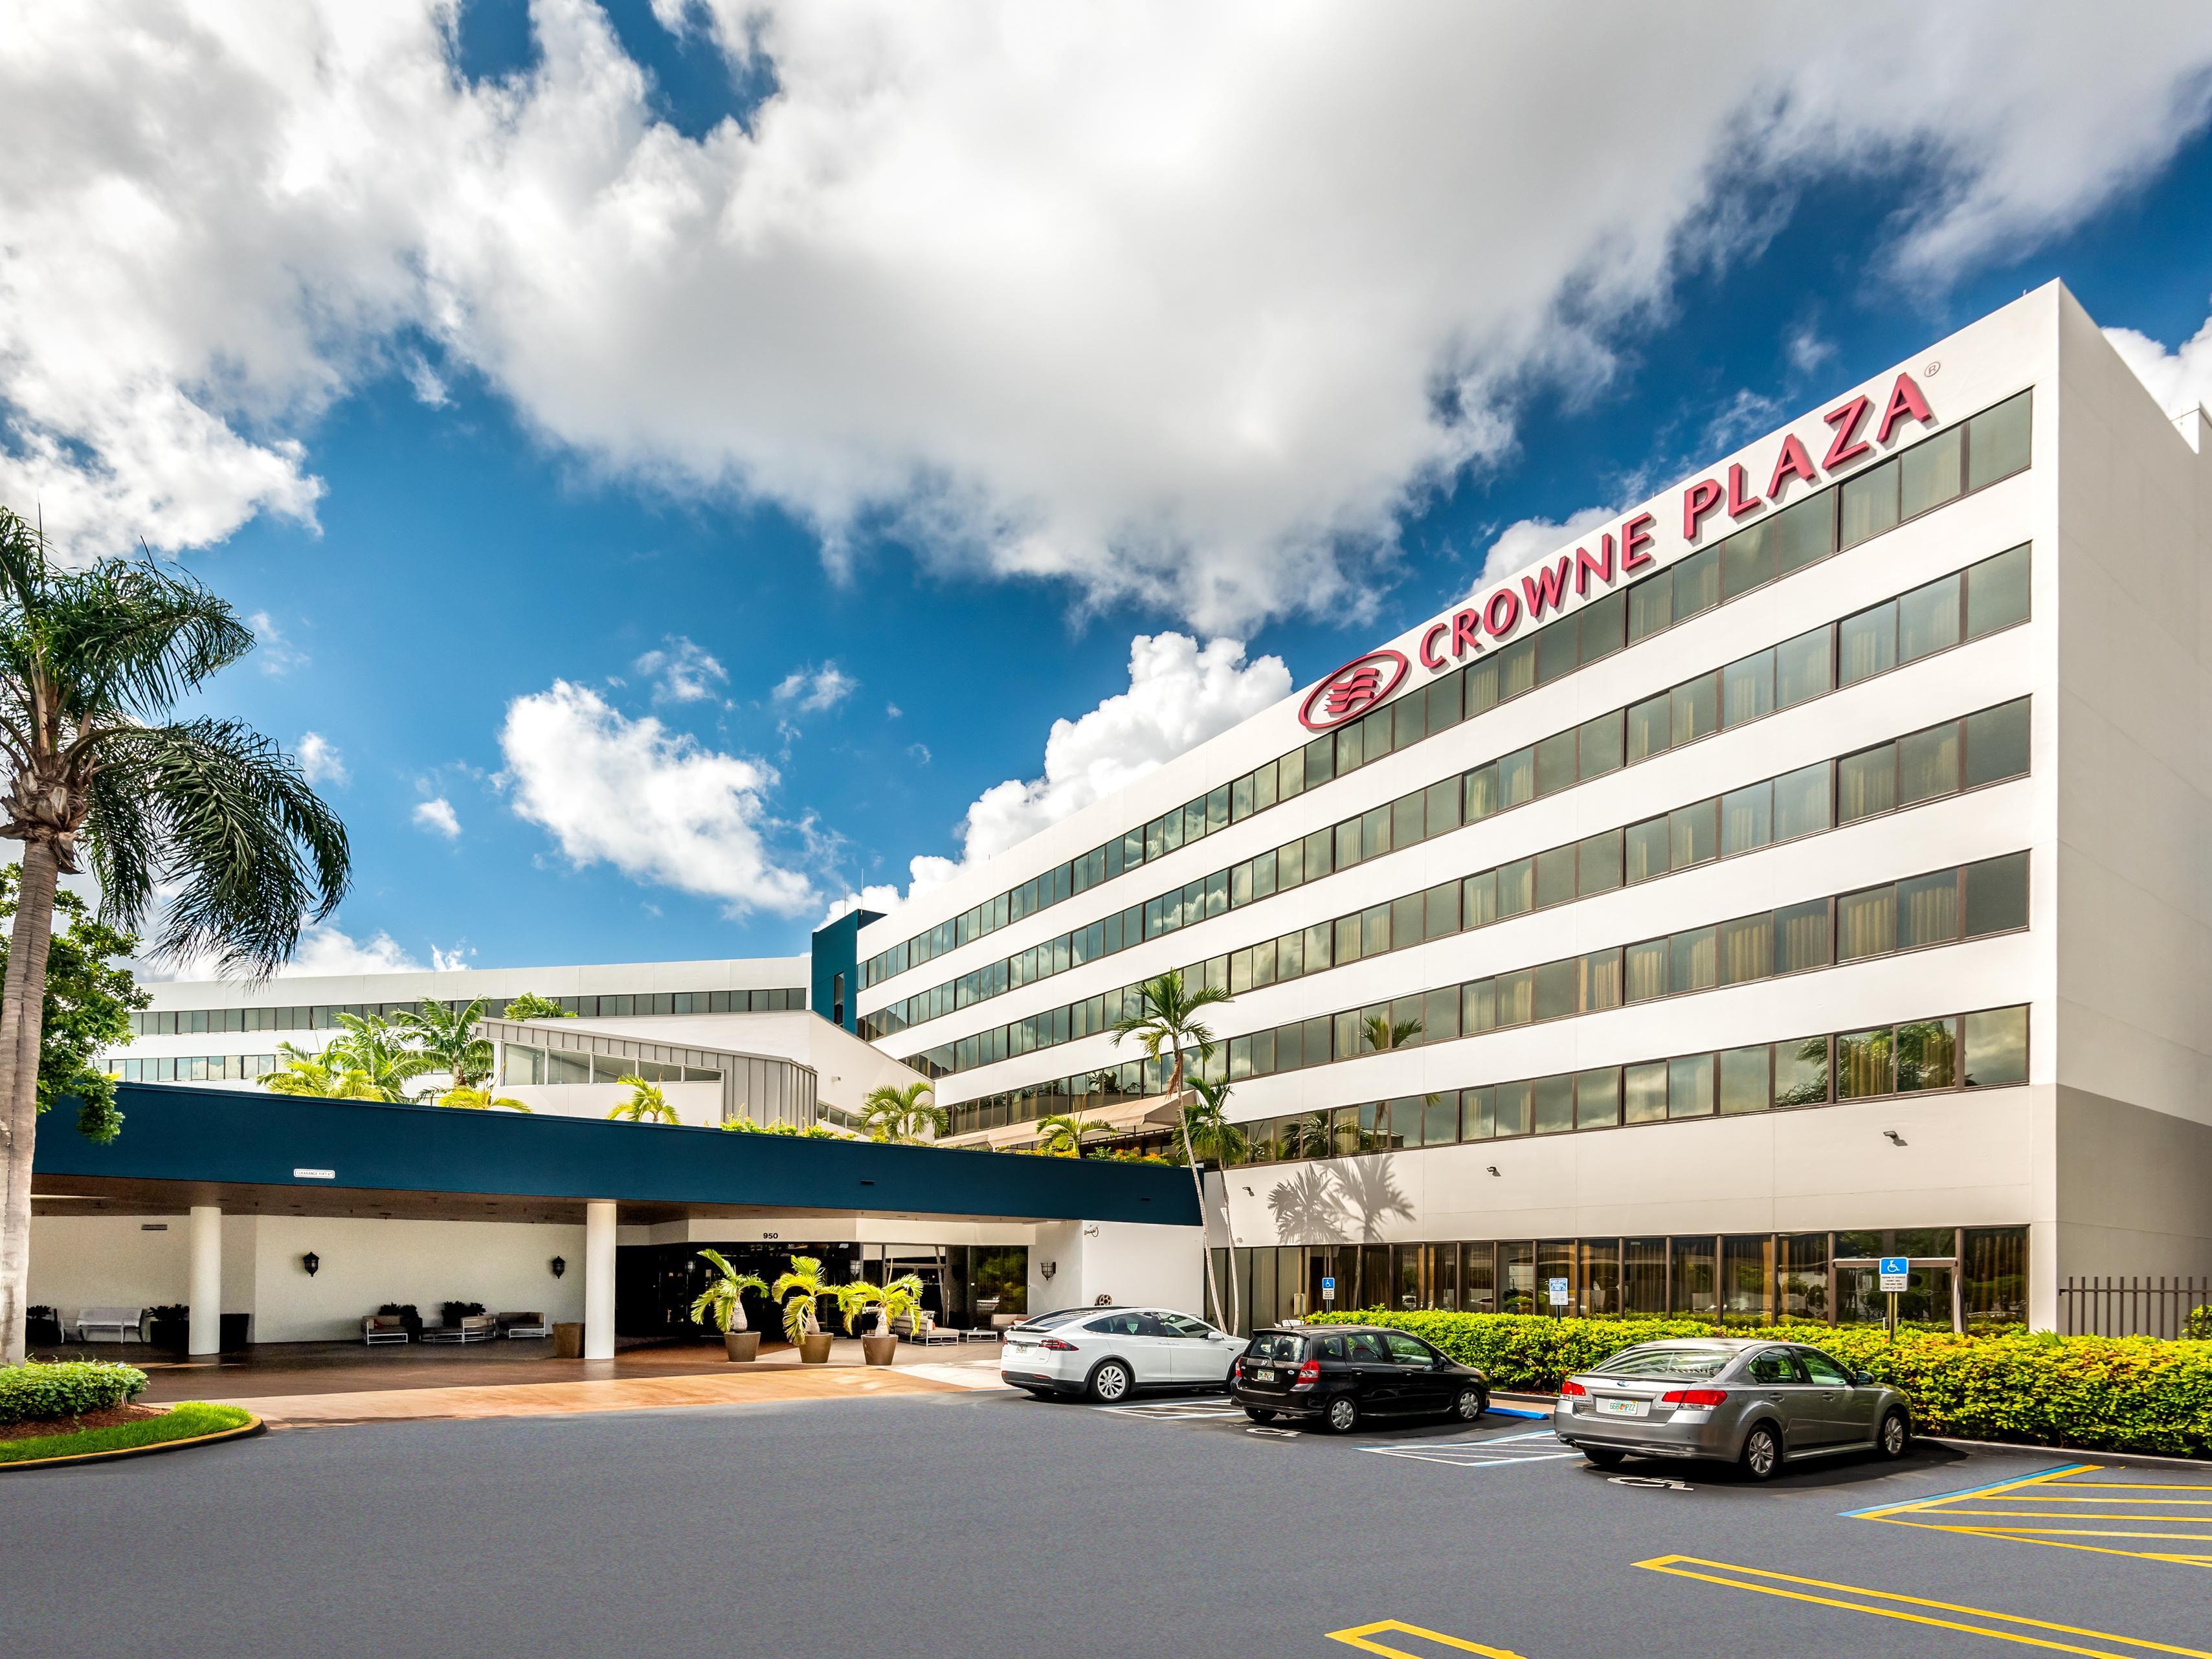 Business Hotels Near Miami Airport Mia Crowne Plaza